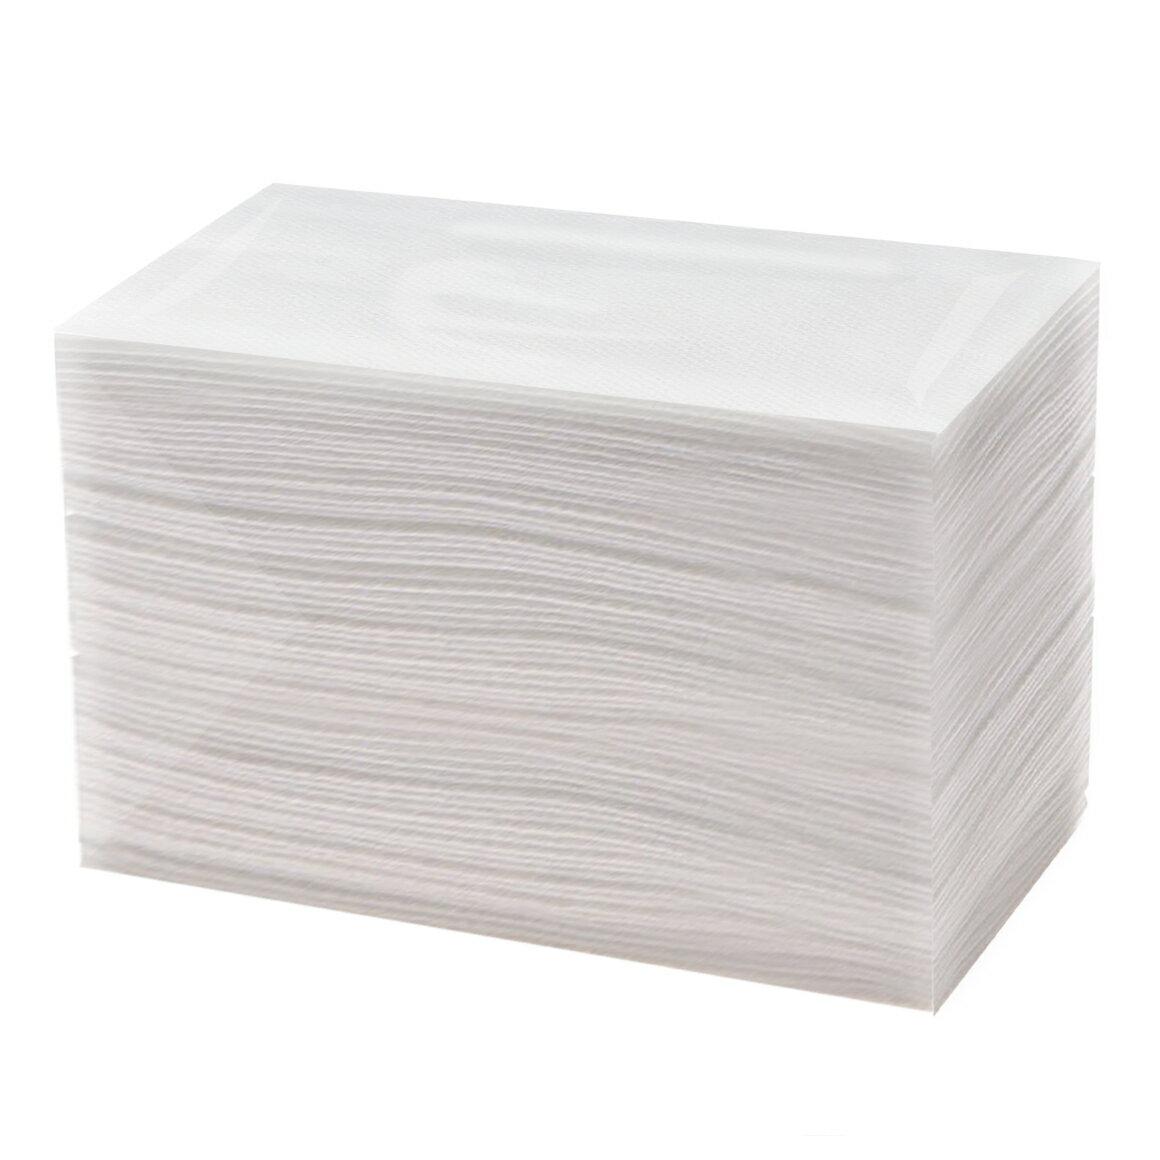 【HELLO】三折餐巾紙13X13/100張/24包/箱